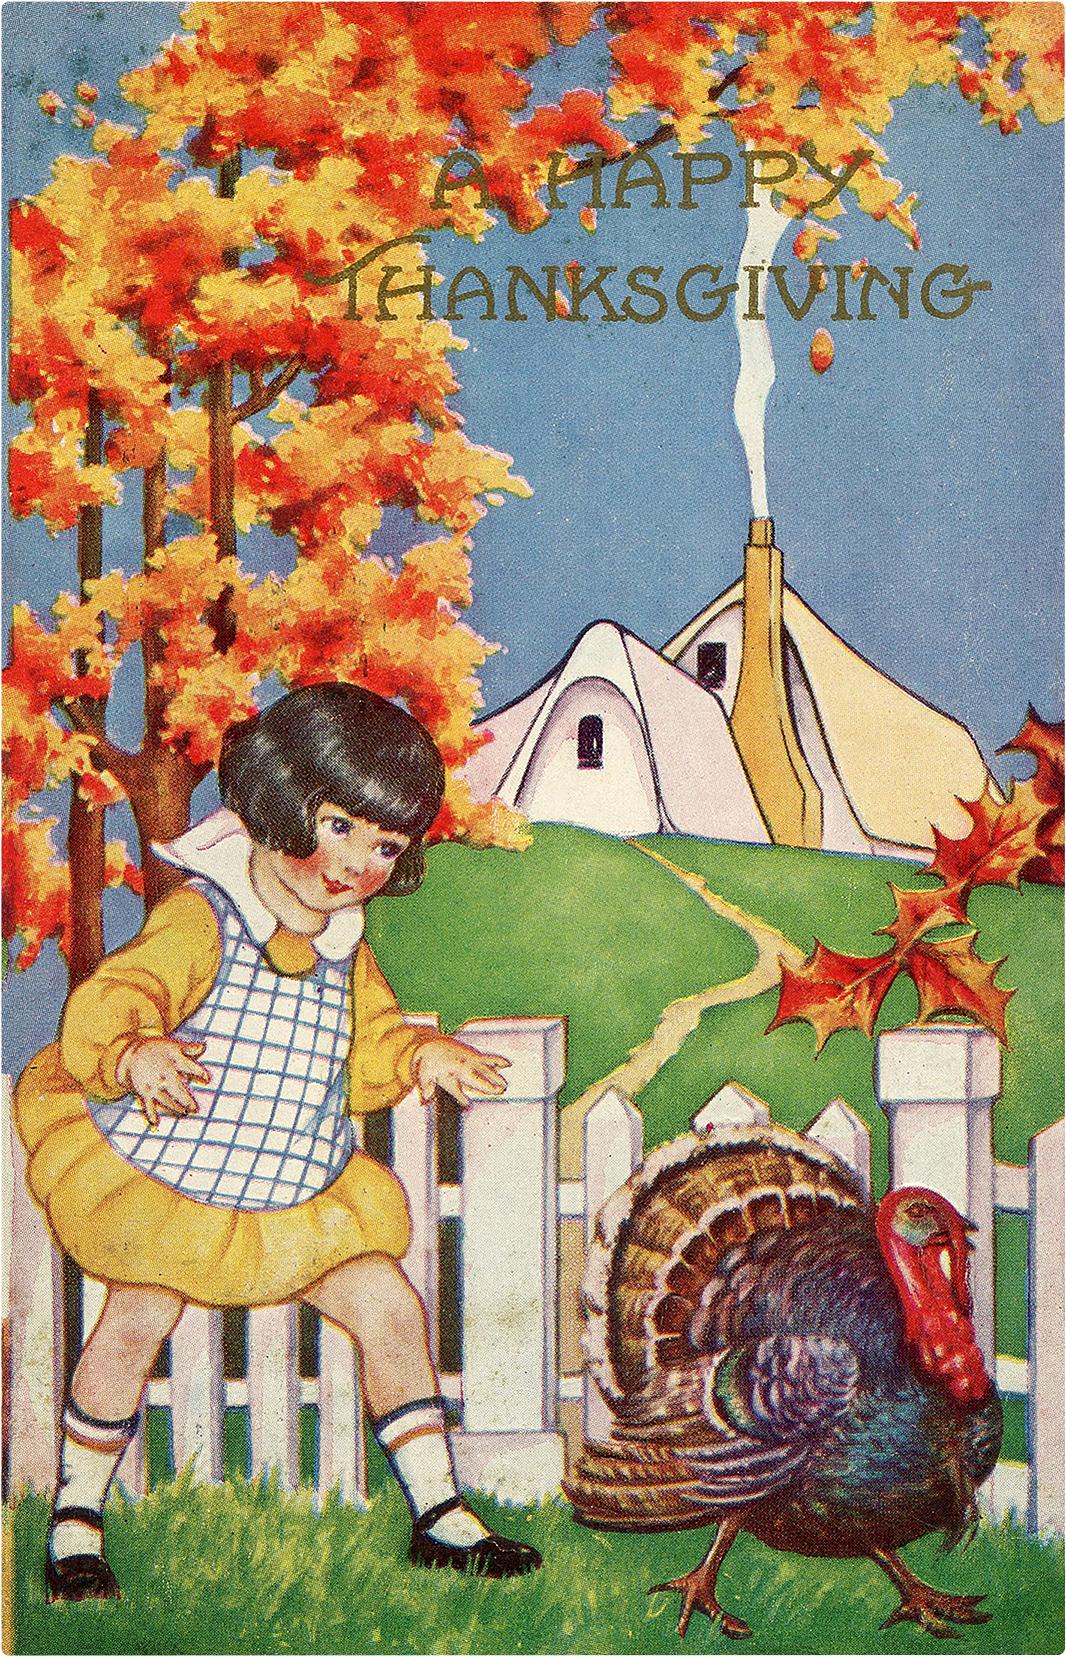 Girl chasing Turkey Image